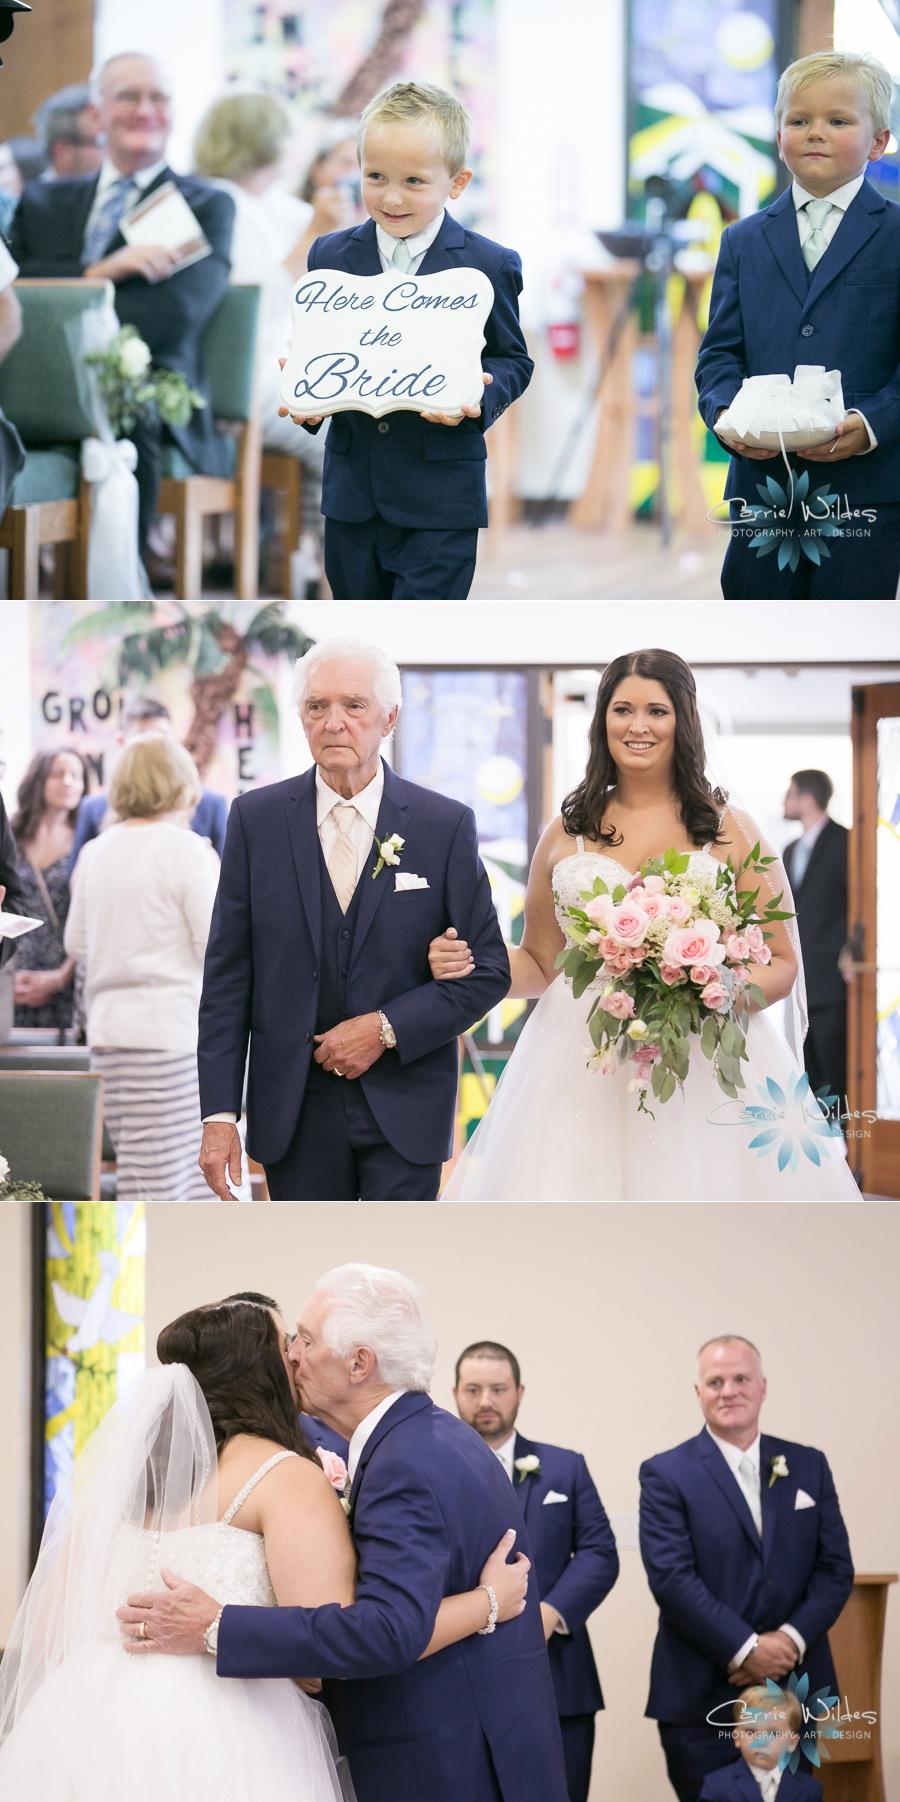 8_4_18 Charlie and Julie Bon Apetit Dunedin Wedding_0025.jpg